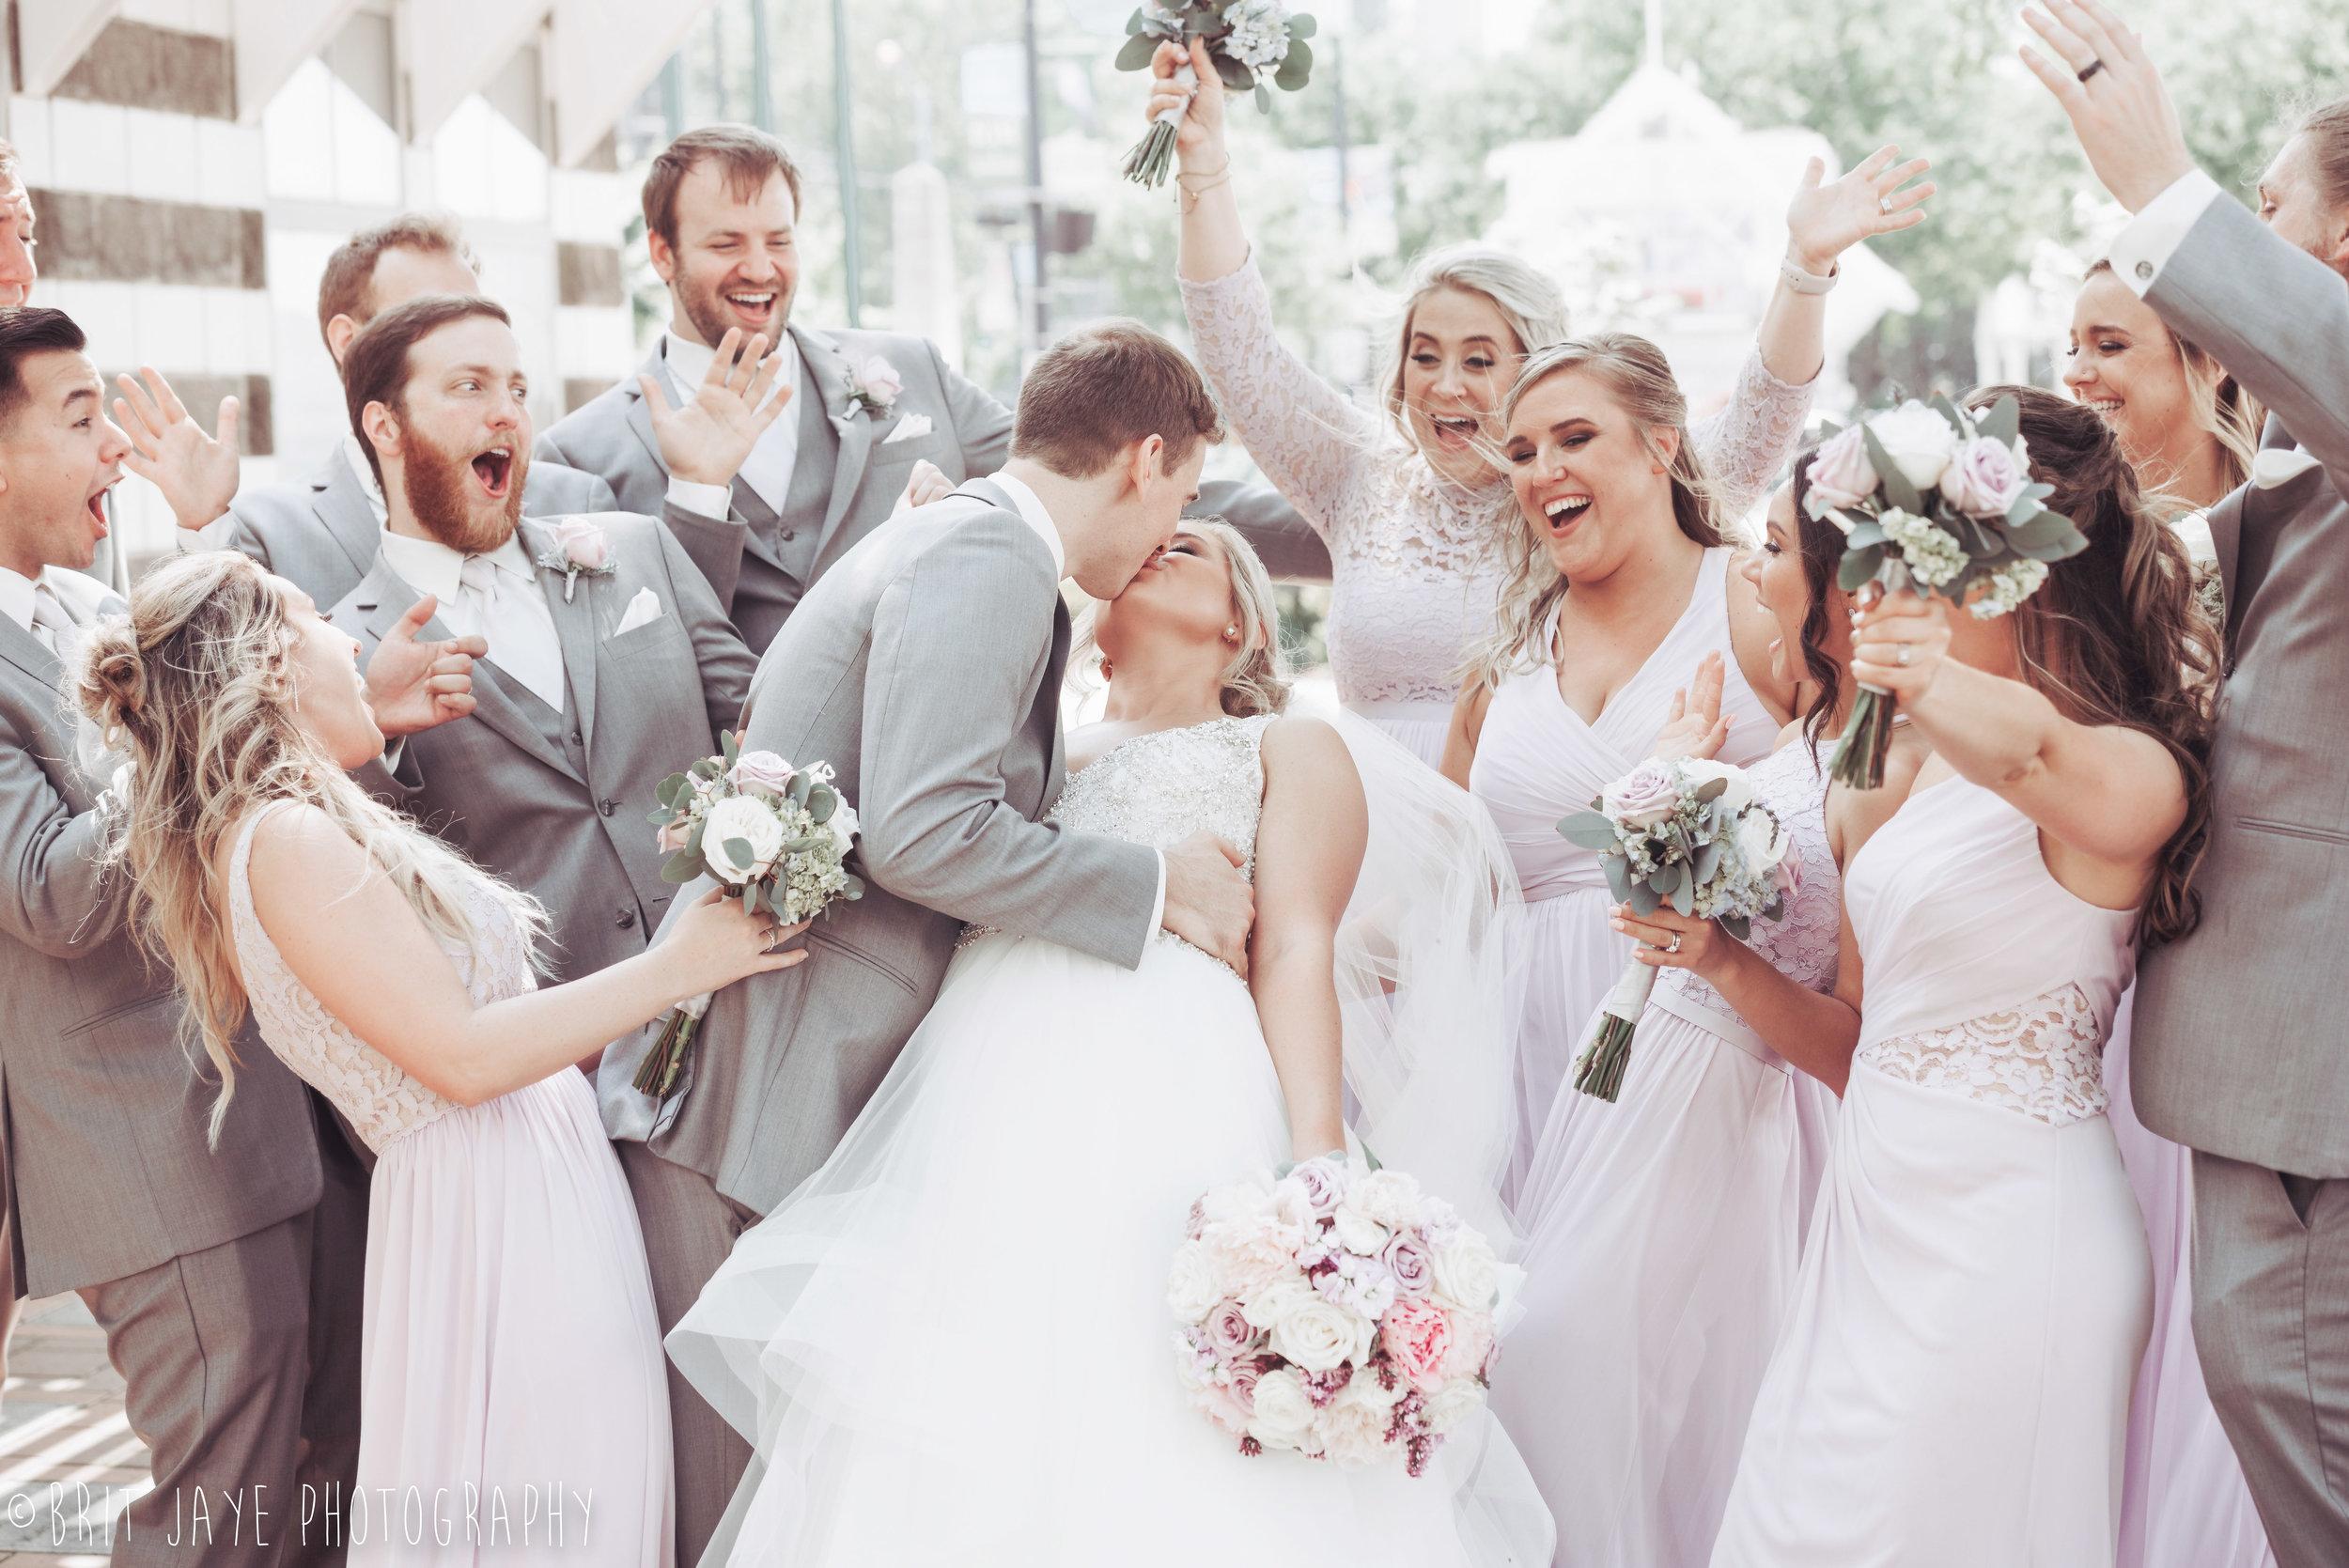 Spring_Wedding_at_Steam_Plant_Dayton-1-2.jpg